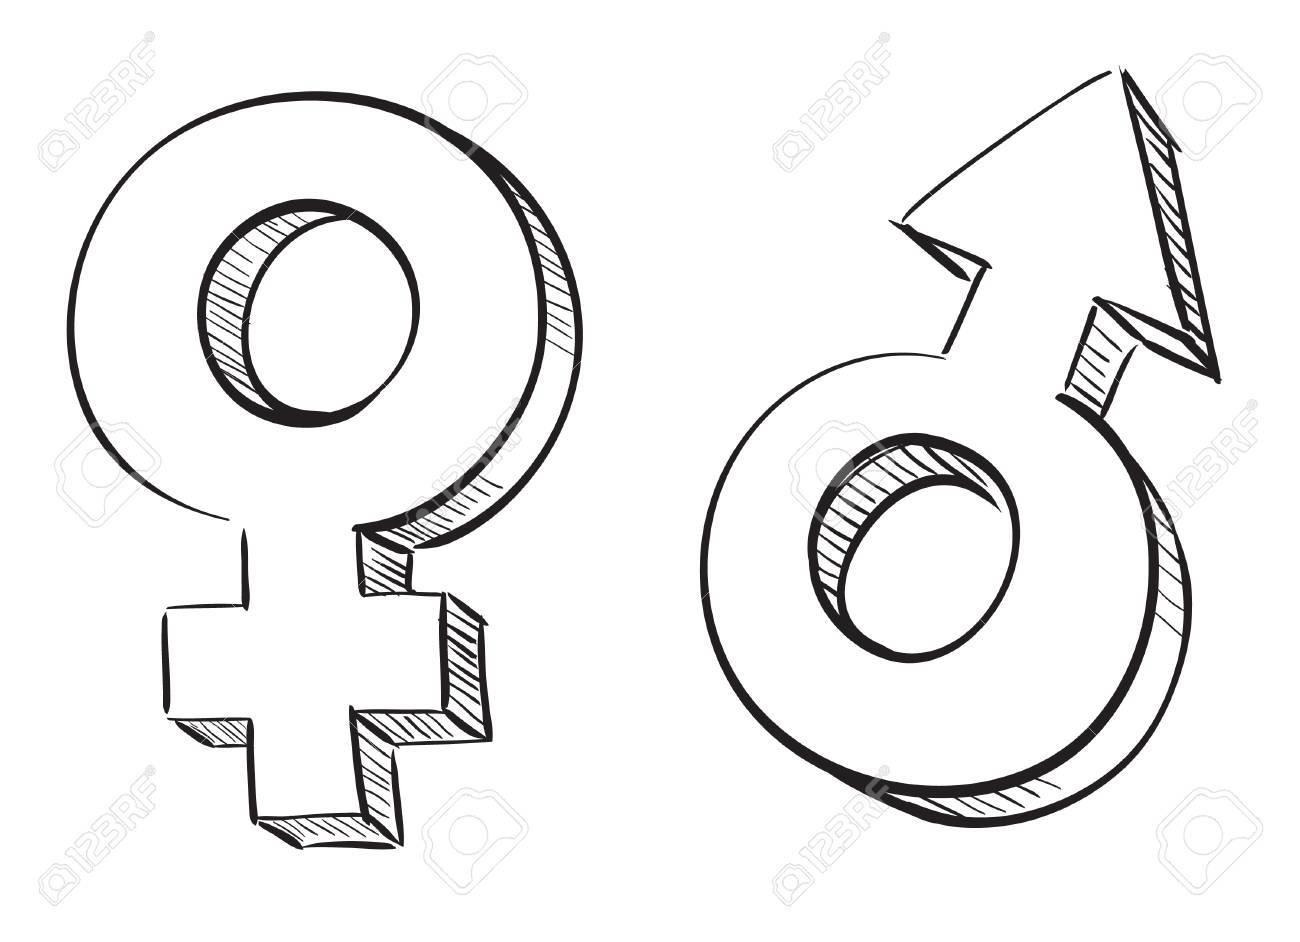 Male and female symbols Stock Vector - 7857685